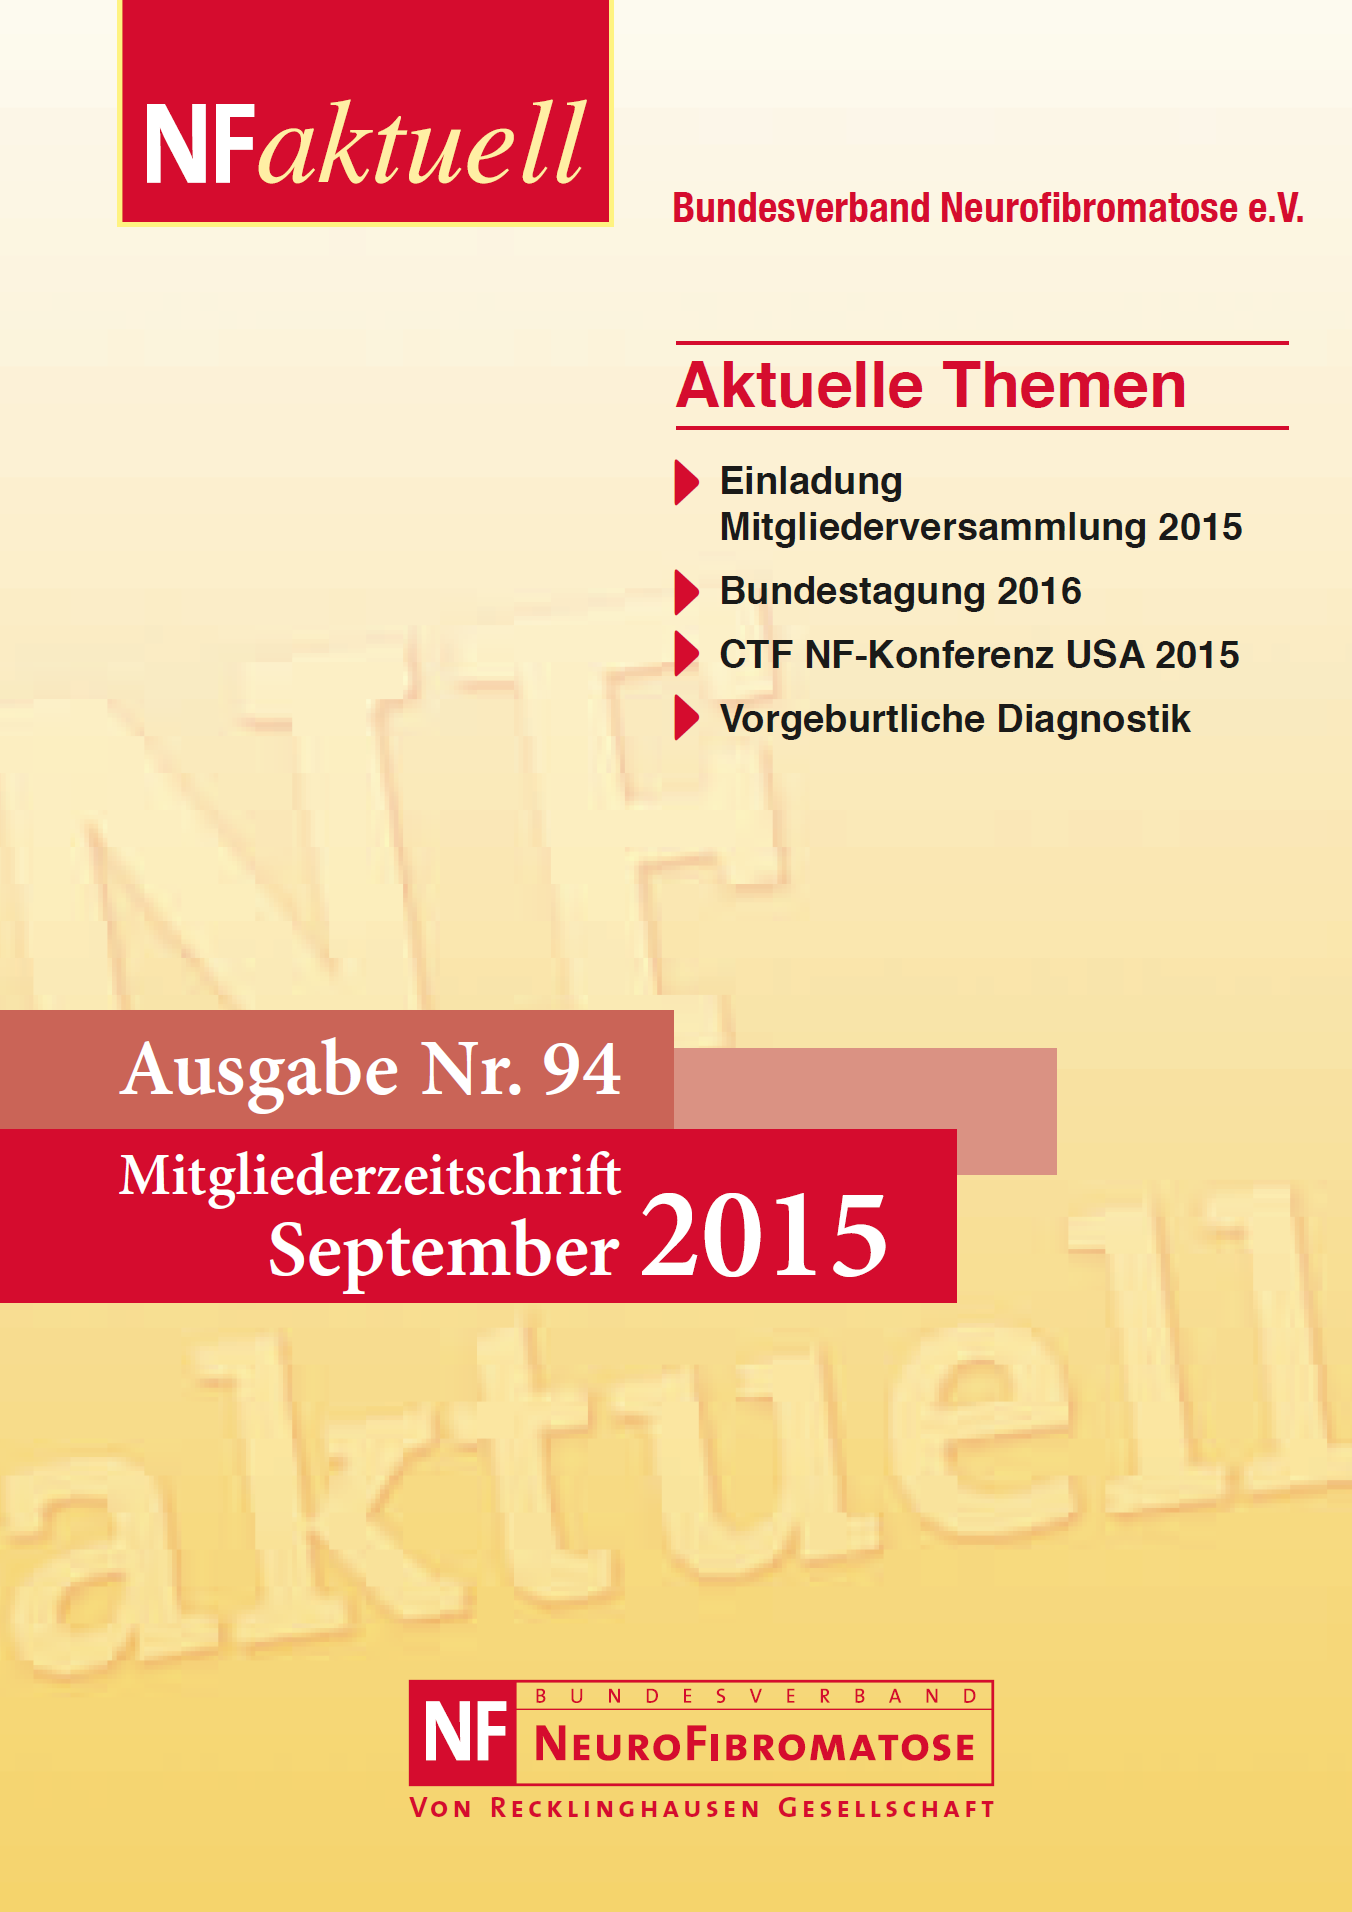 NFaktuell-94-september-2015-titel